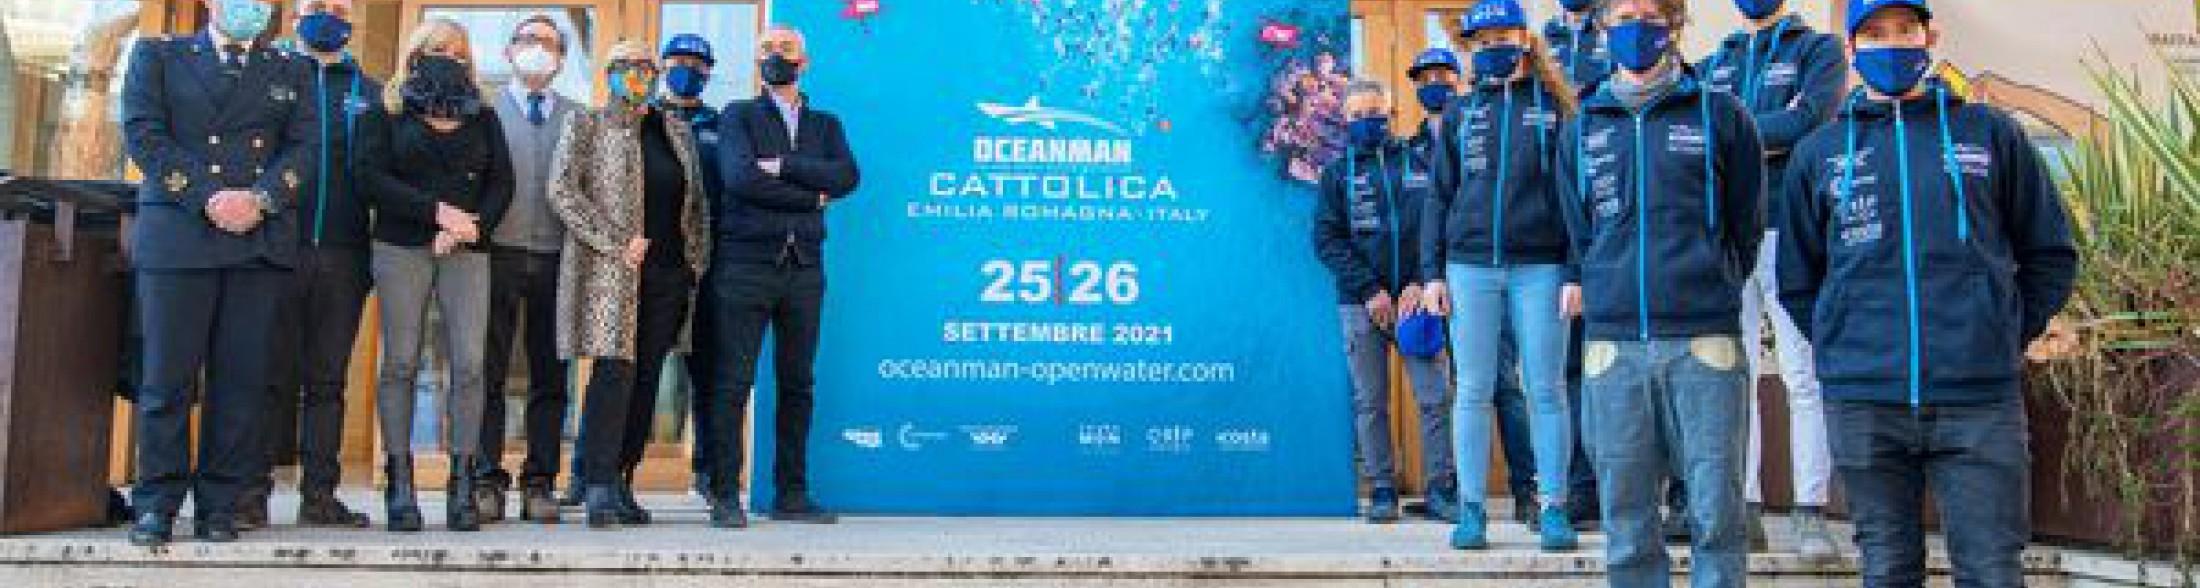 OceanMan arriva all'Acquario di Cattolica